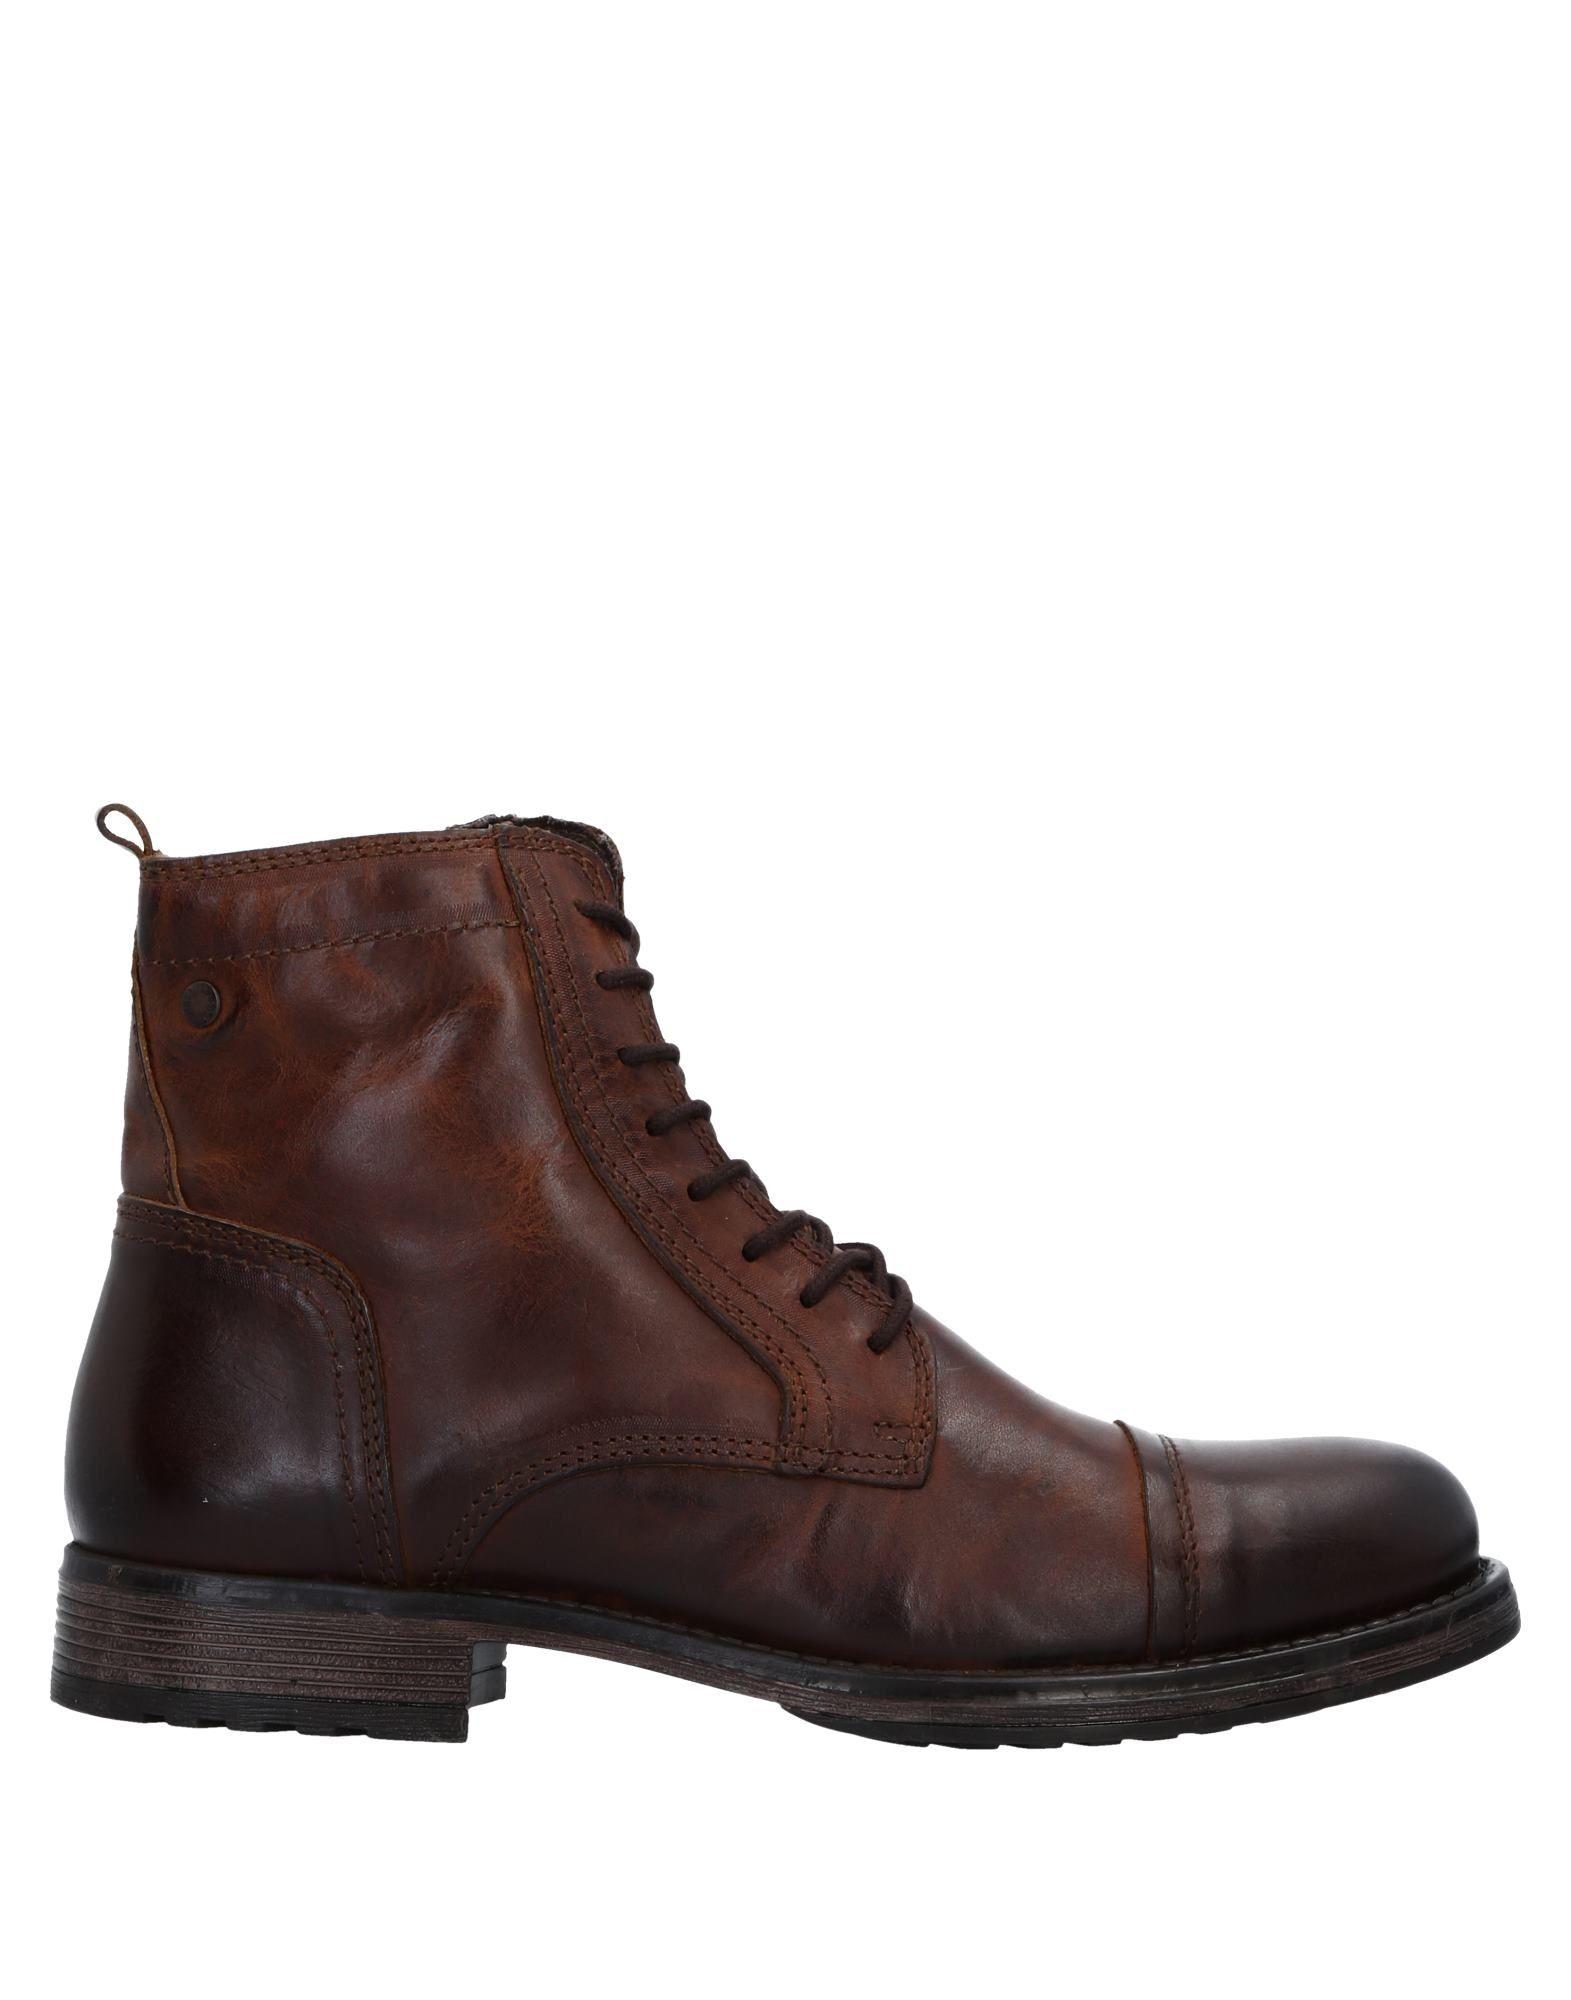 Jack & Jack Jones Boots - Men Jack & & Jones Boots online on  Australia - 11543691VT ba6b45